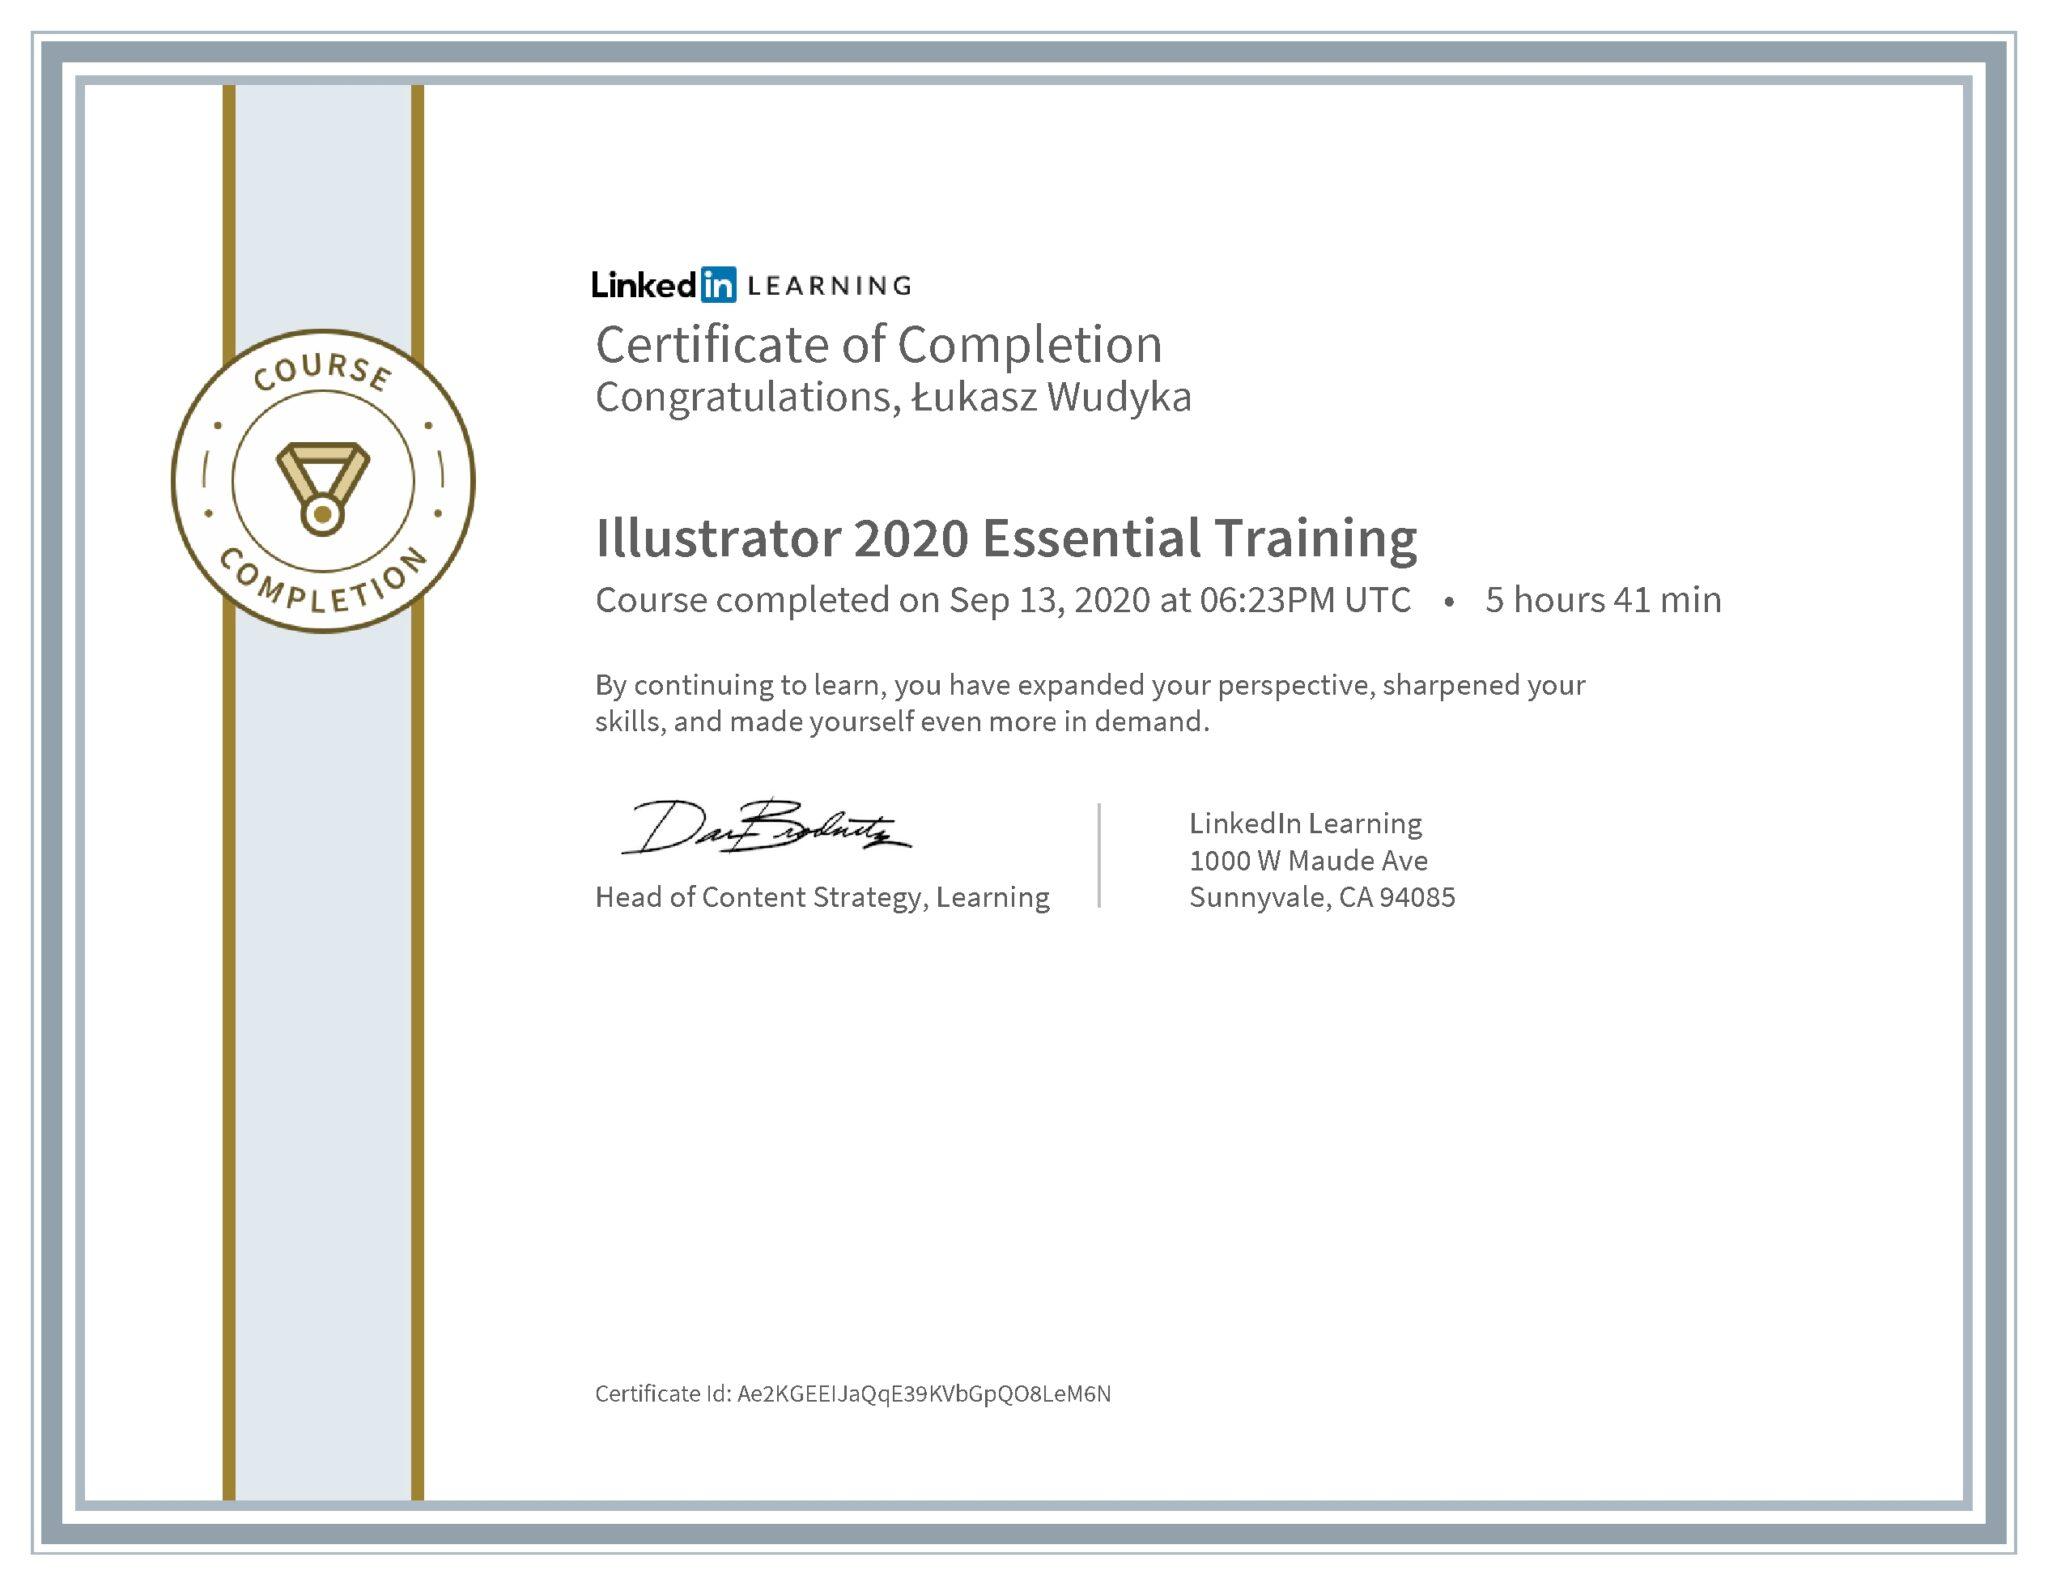 Łukasz Wudyka certyfikat LinkedIn Illustrator 2020 Essential Training